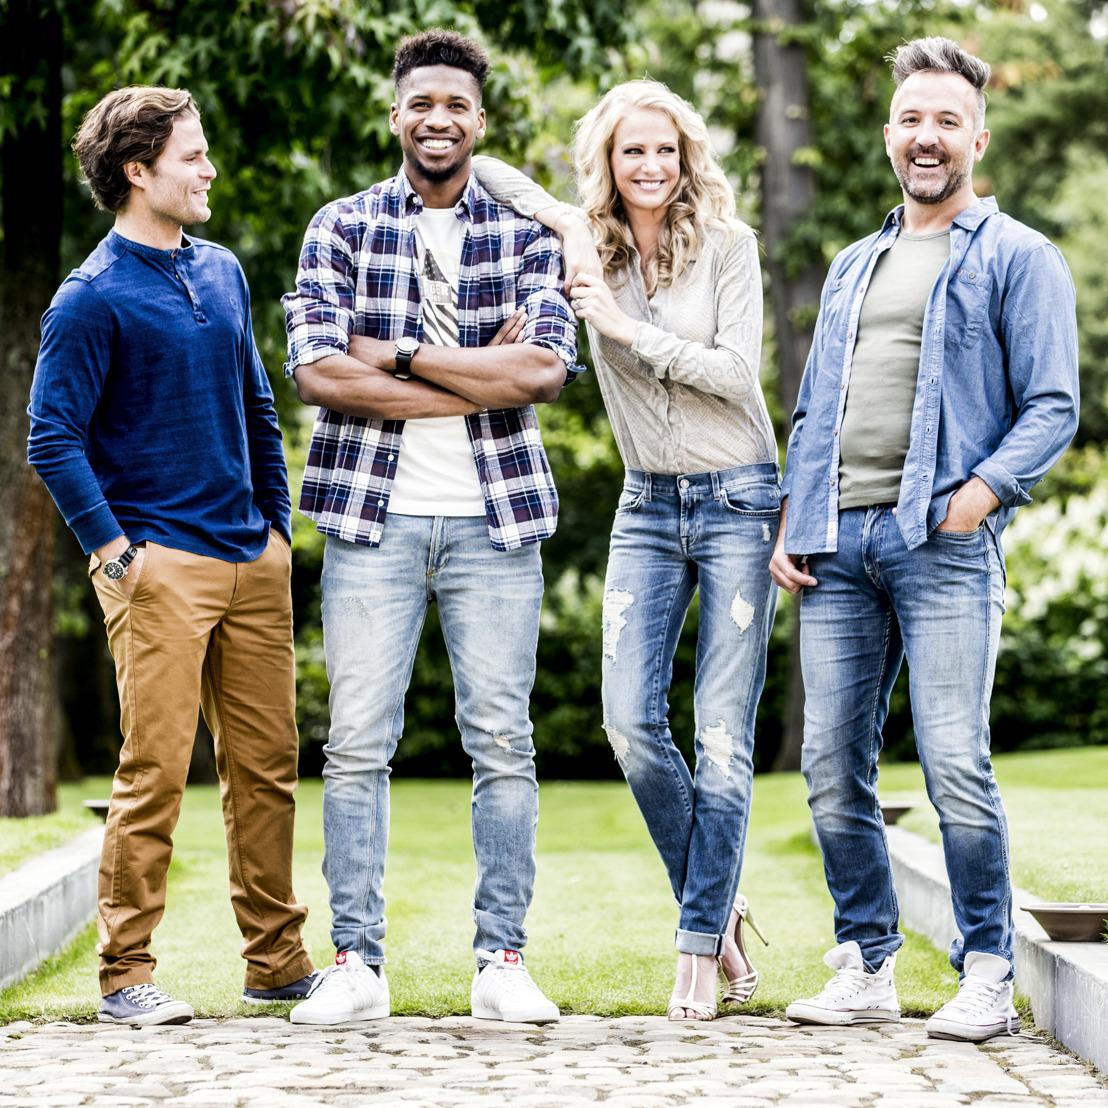 Fotomateriaal: Annelien Coorevits helpt drie mannen tijdens hun liefdeszoektocht